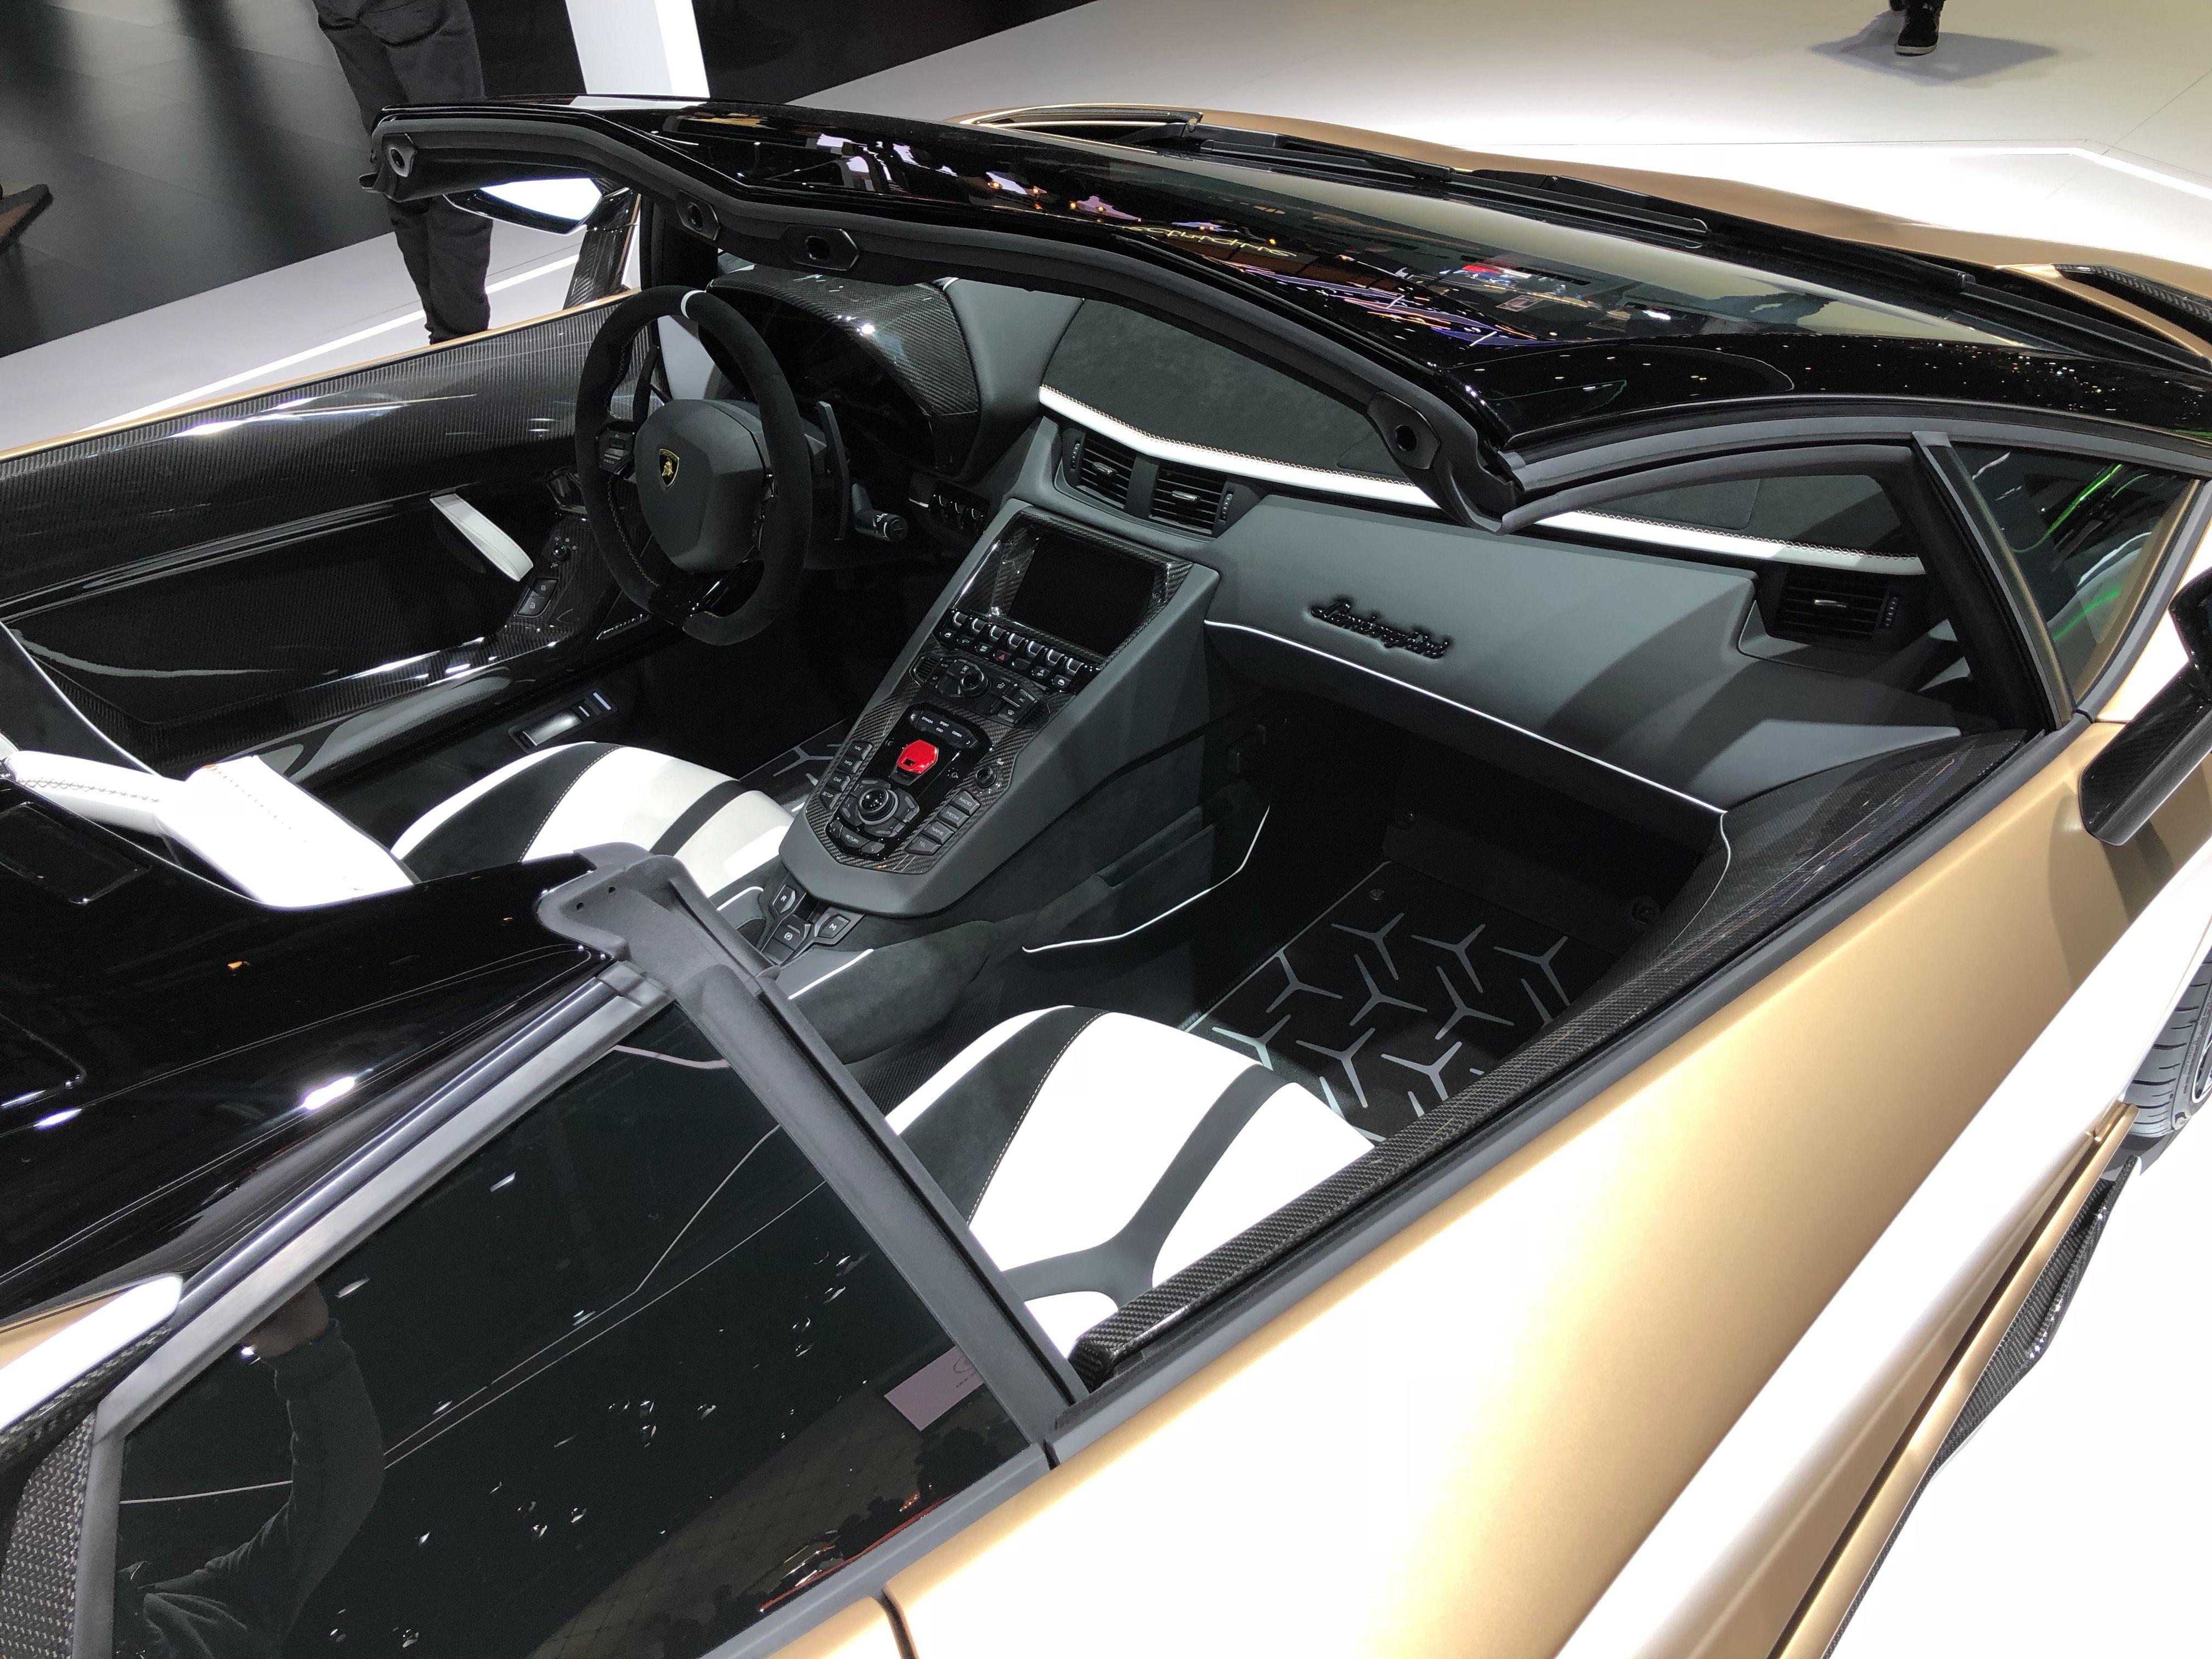 Photos of the Lamborghini Aventador SVJ Roadster